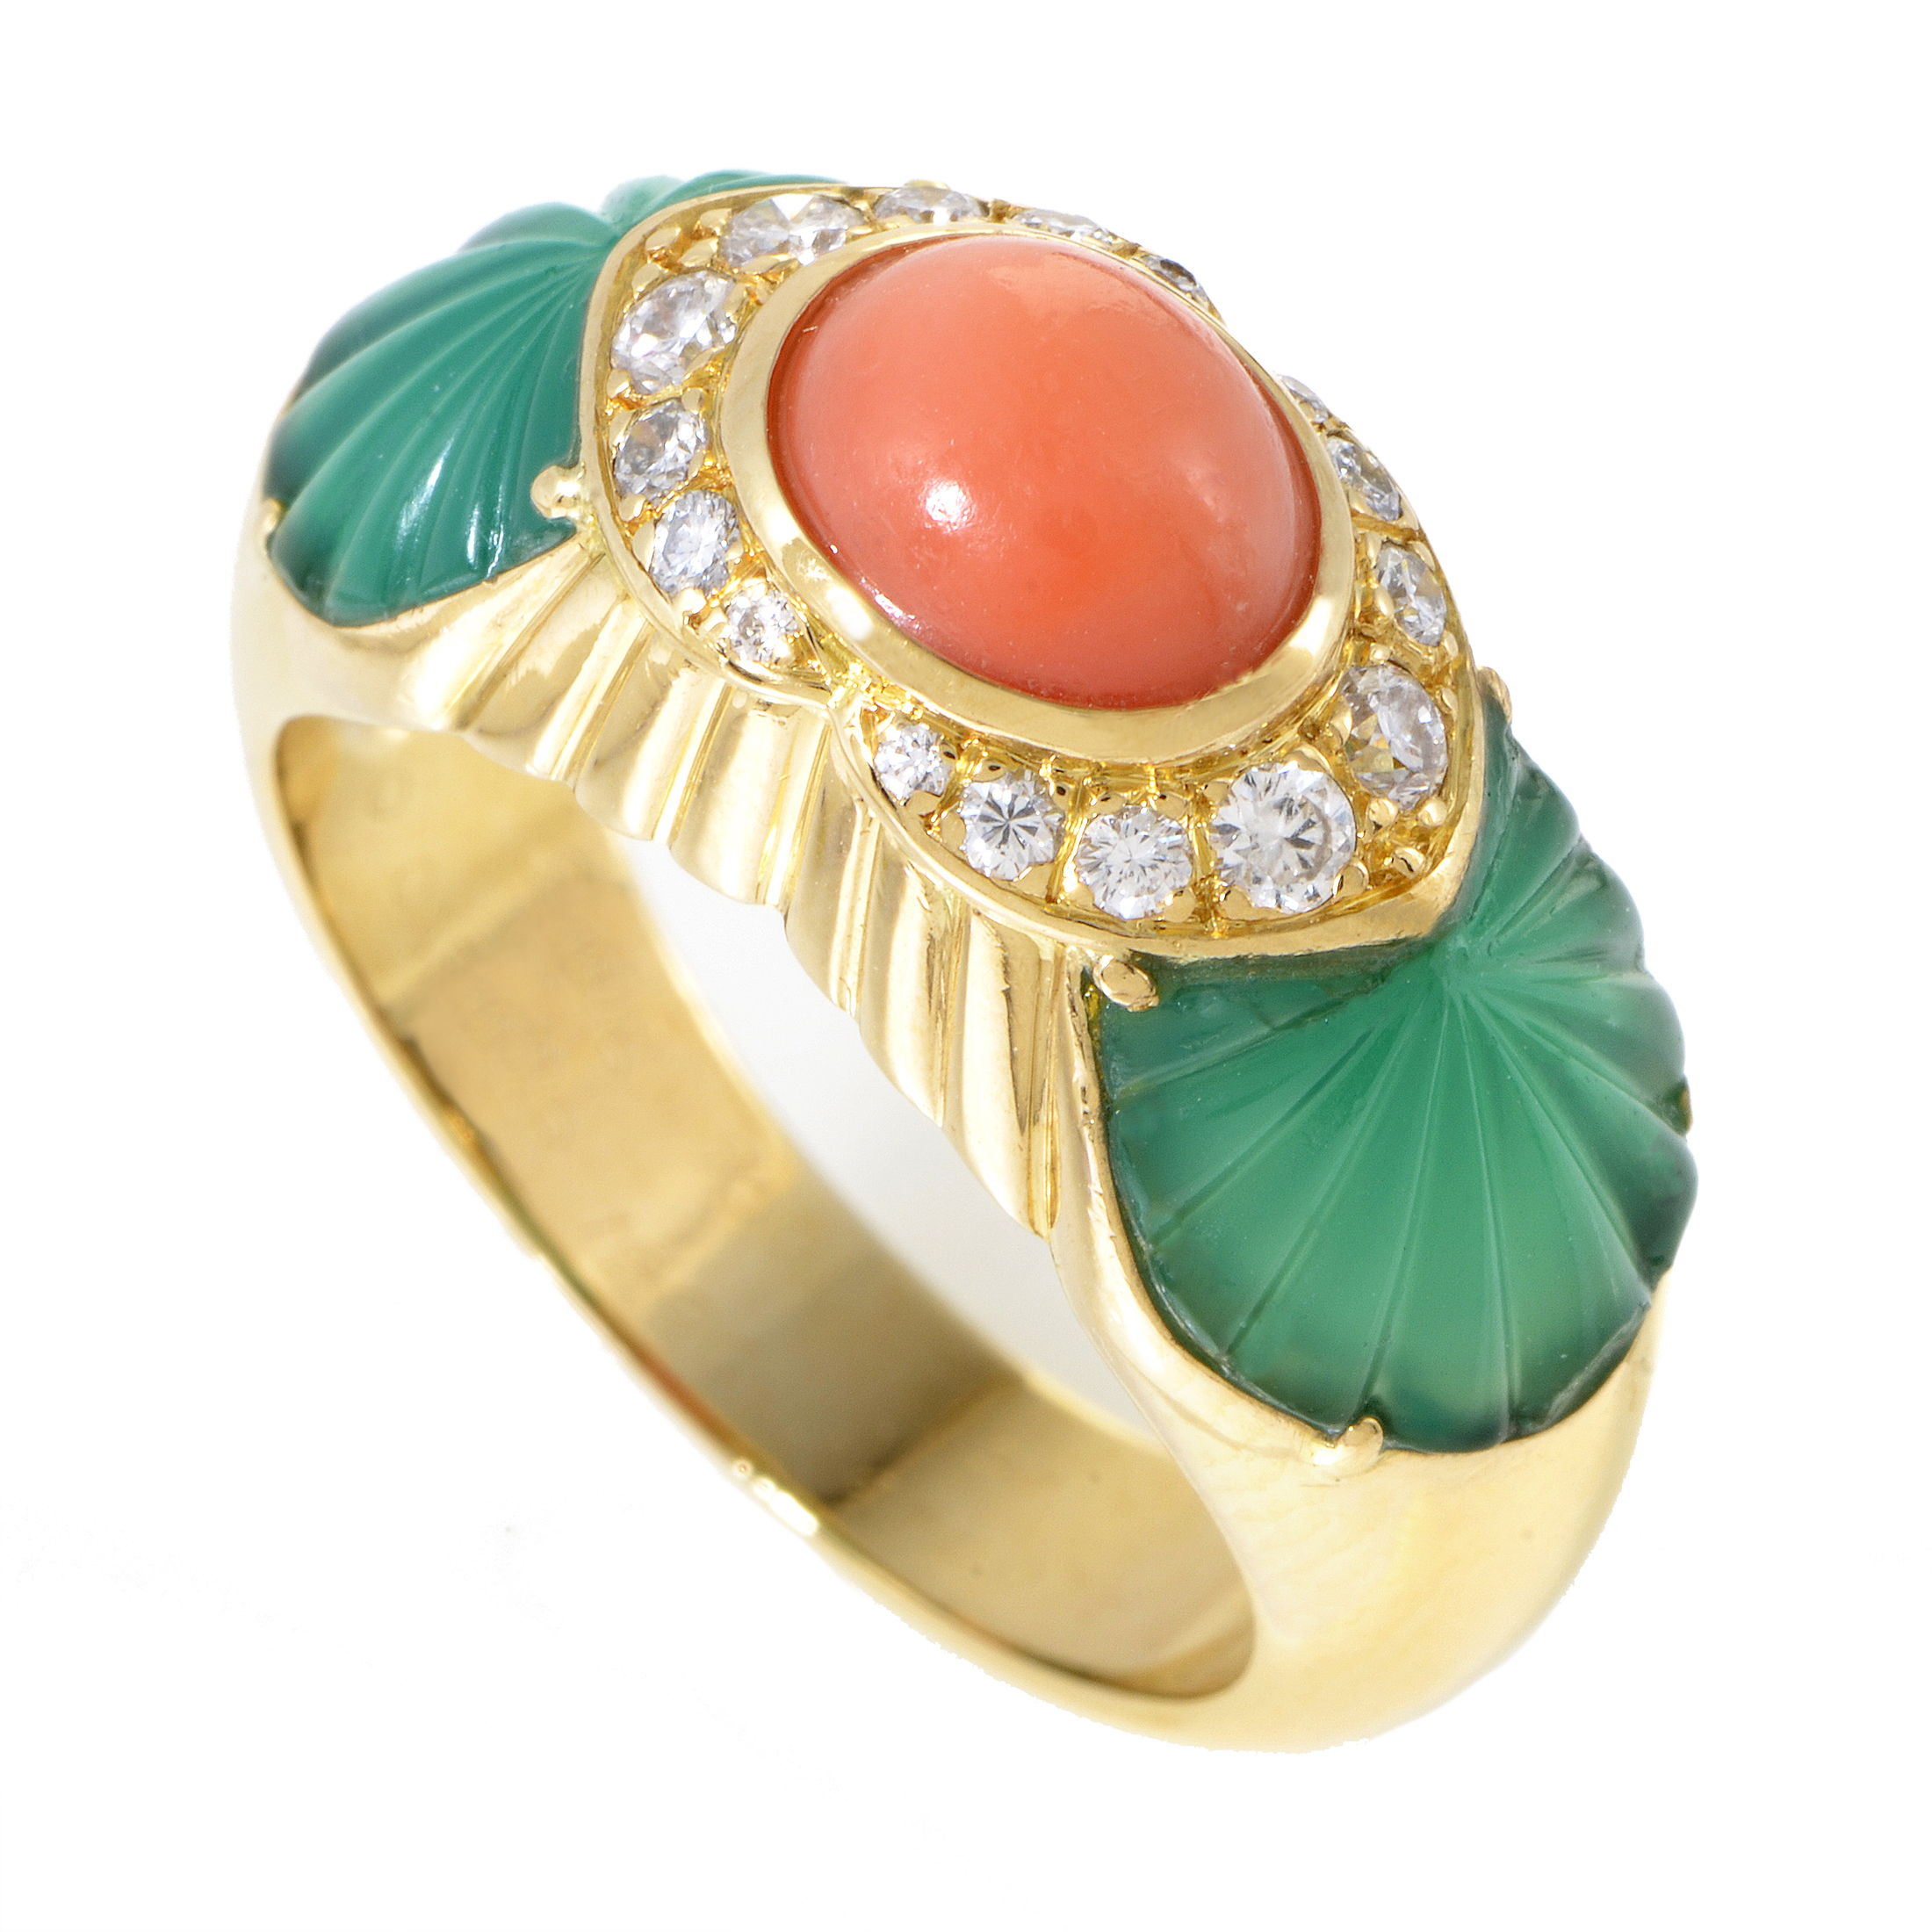 Cartier Women's 18K Yellow Gold Diamond & Gemstone Ring